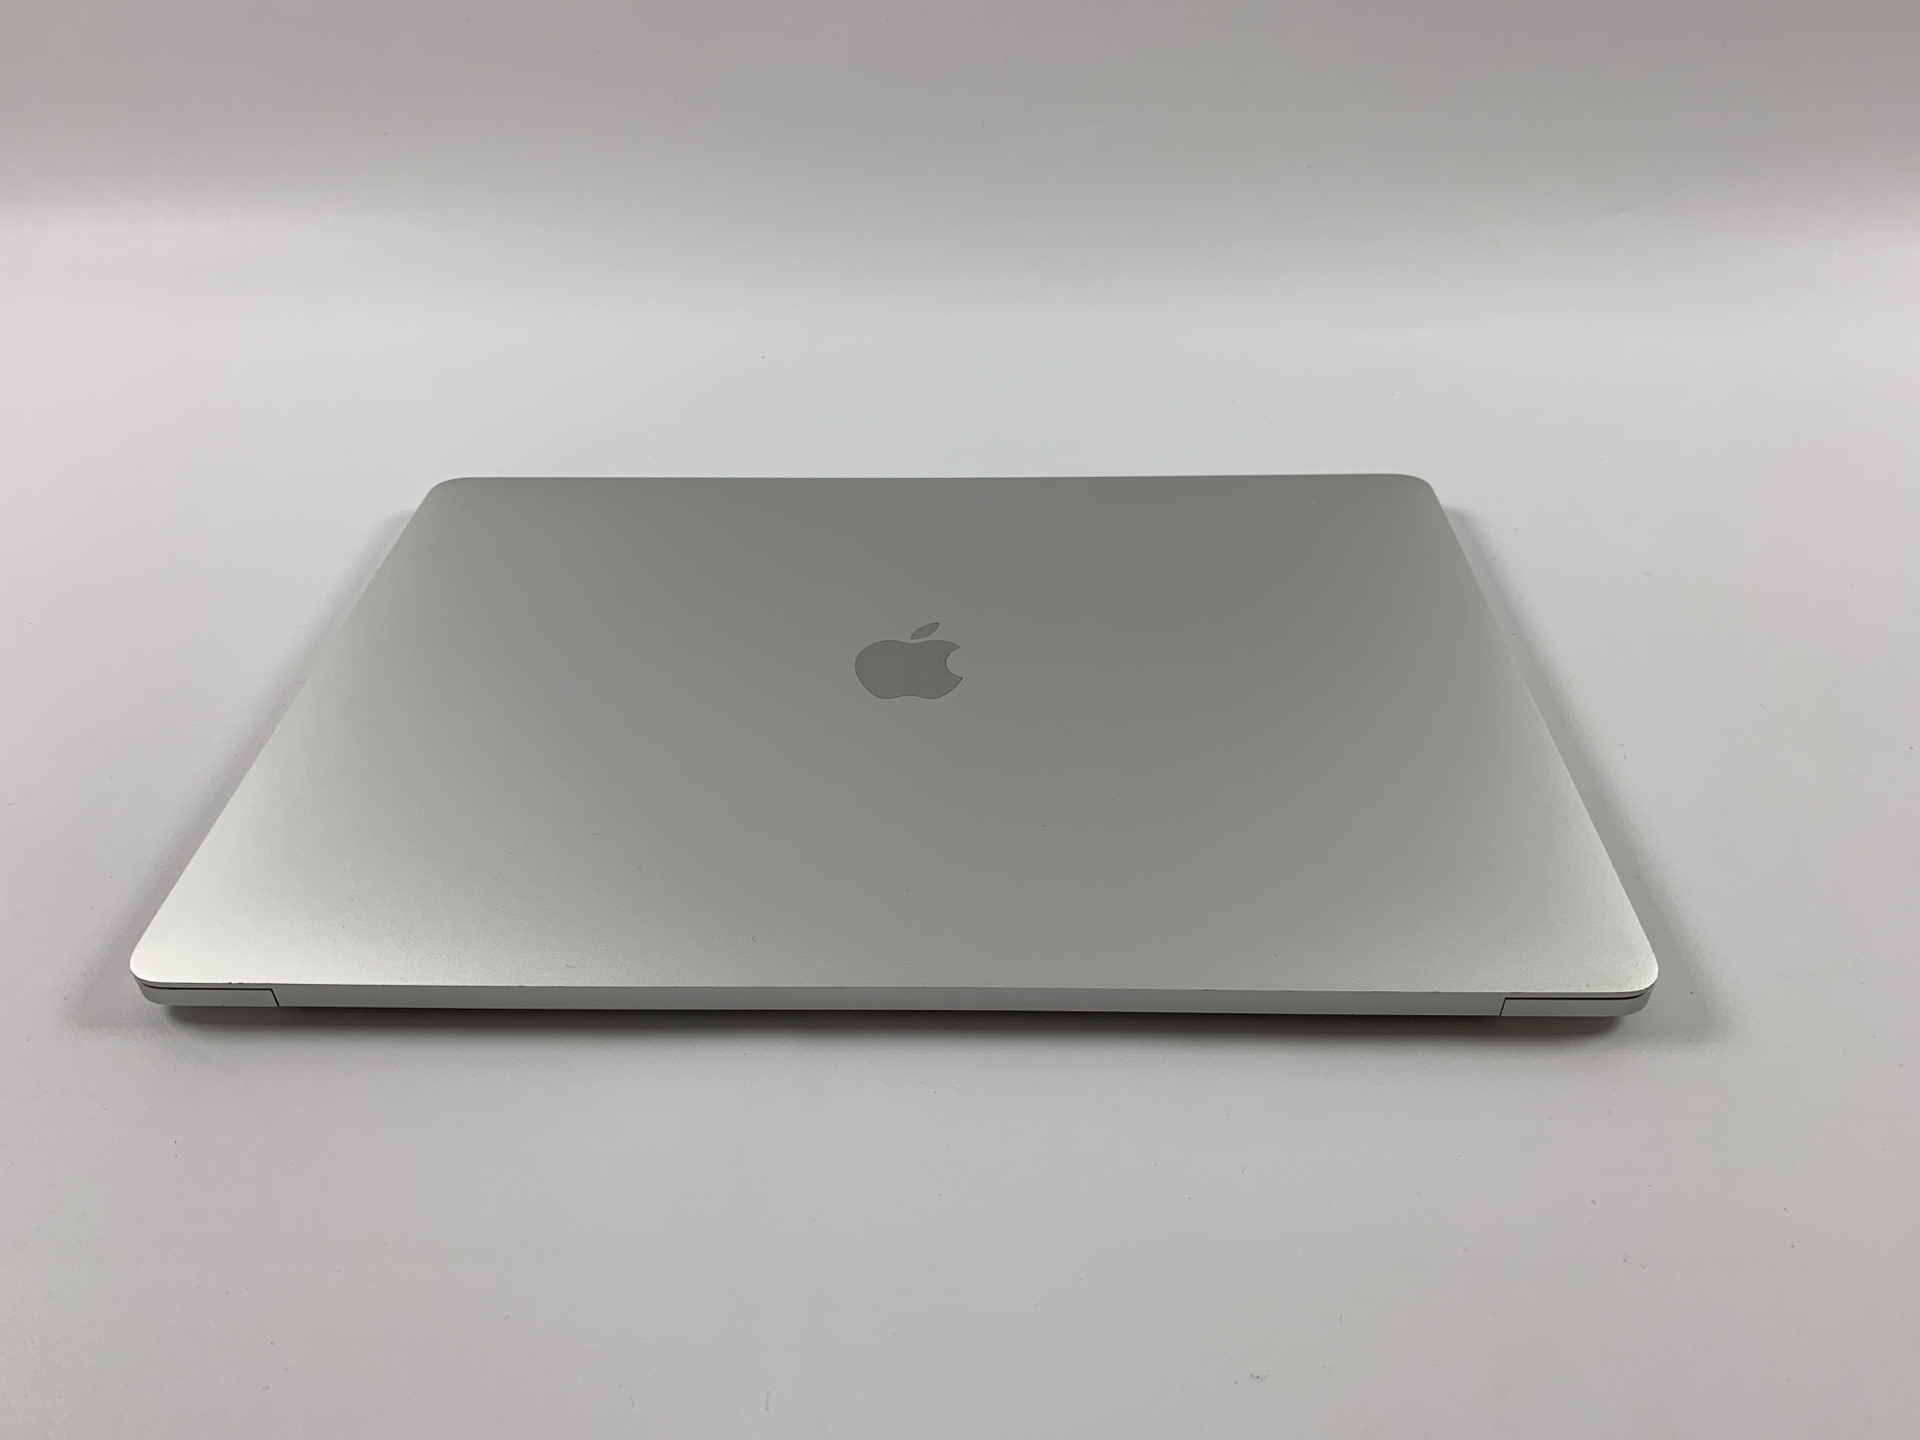 "MacBook Pro 15"" Touch Bar Late 2016 (Intel Quad-Core i7 2.7 GHz 16 GB RAM 512 GB SSD), Silver, Intel Quad-Core i7 2.7 GHz, 16 GB RAM, 512 GB SSD, bild 2"